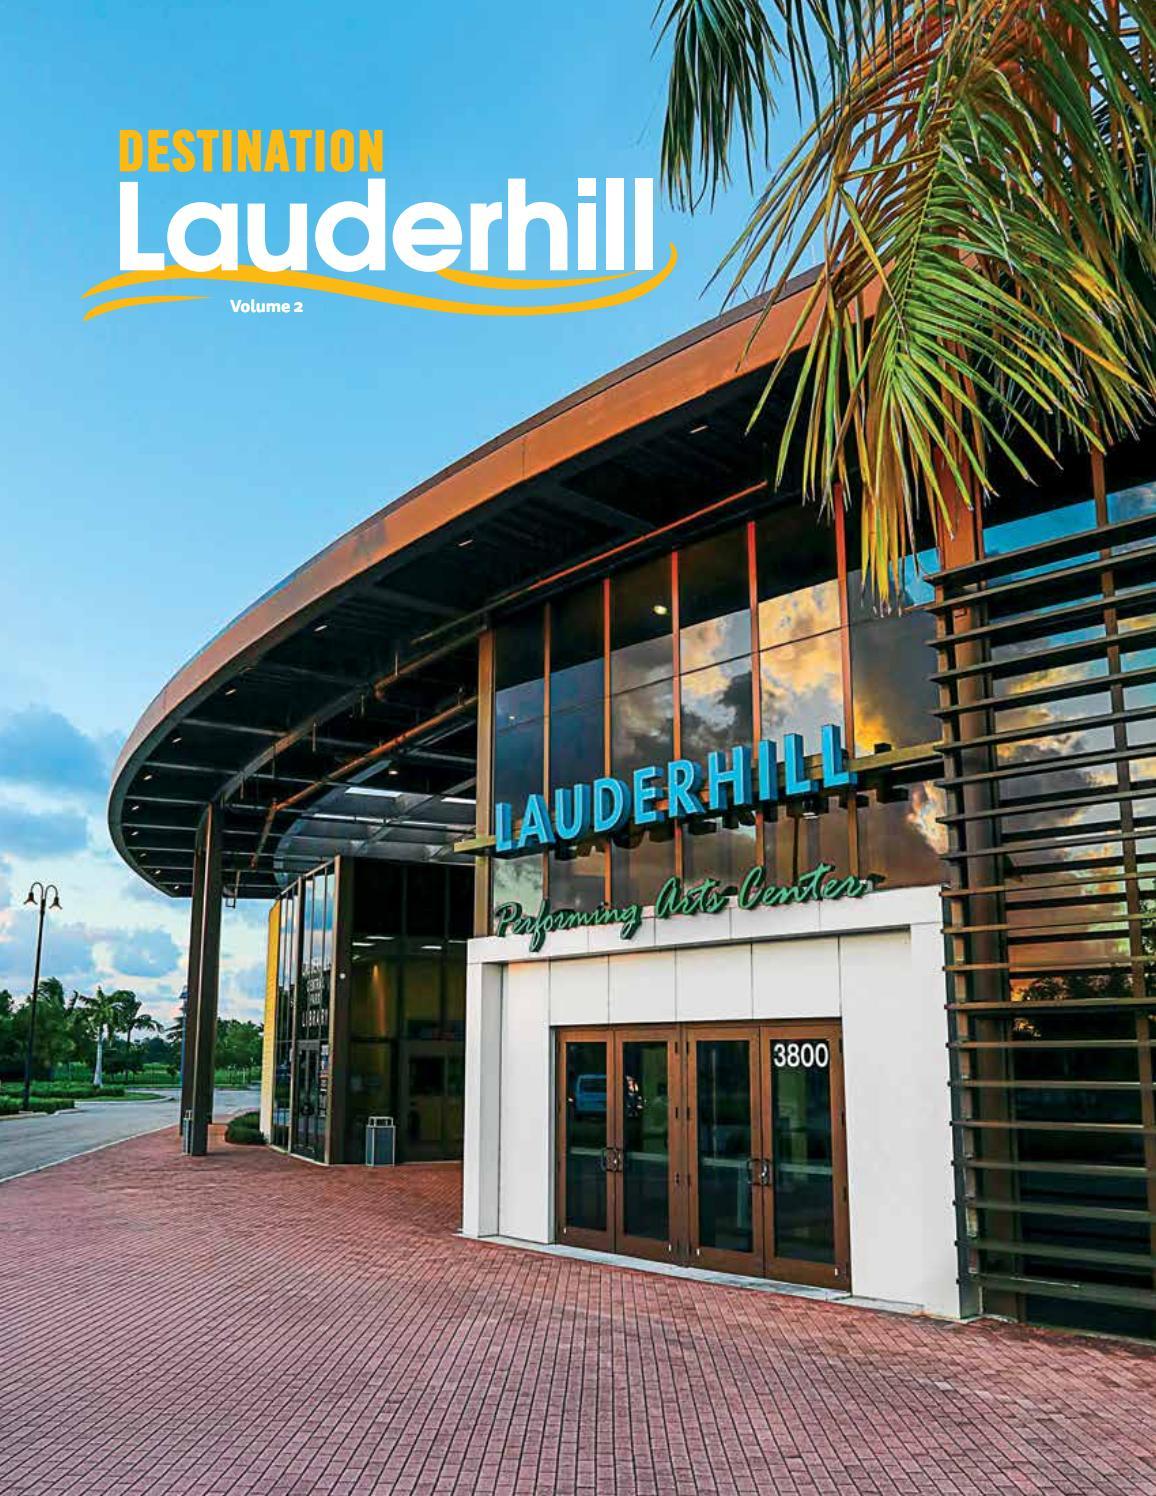 Destination Lauderhill Volume 2 By Destinationlauderhill Issuu